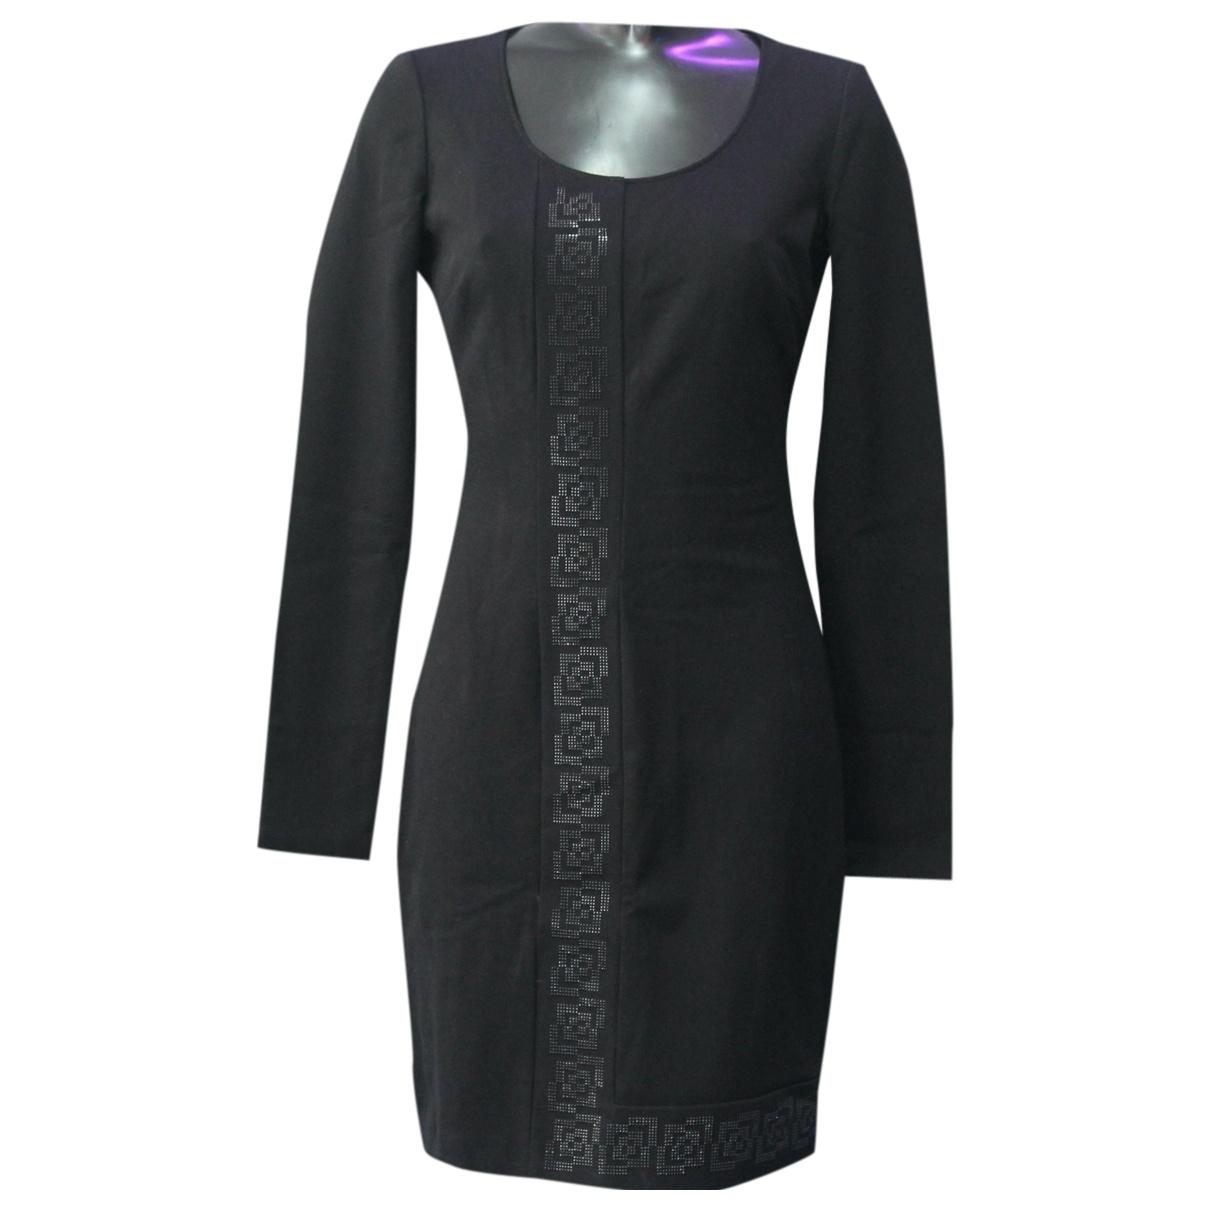 Versace Jeans \N Black Cotton dress for Women 40 IT